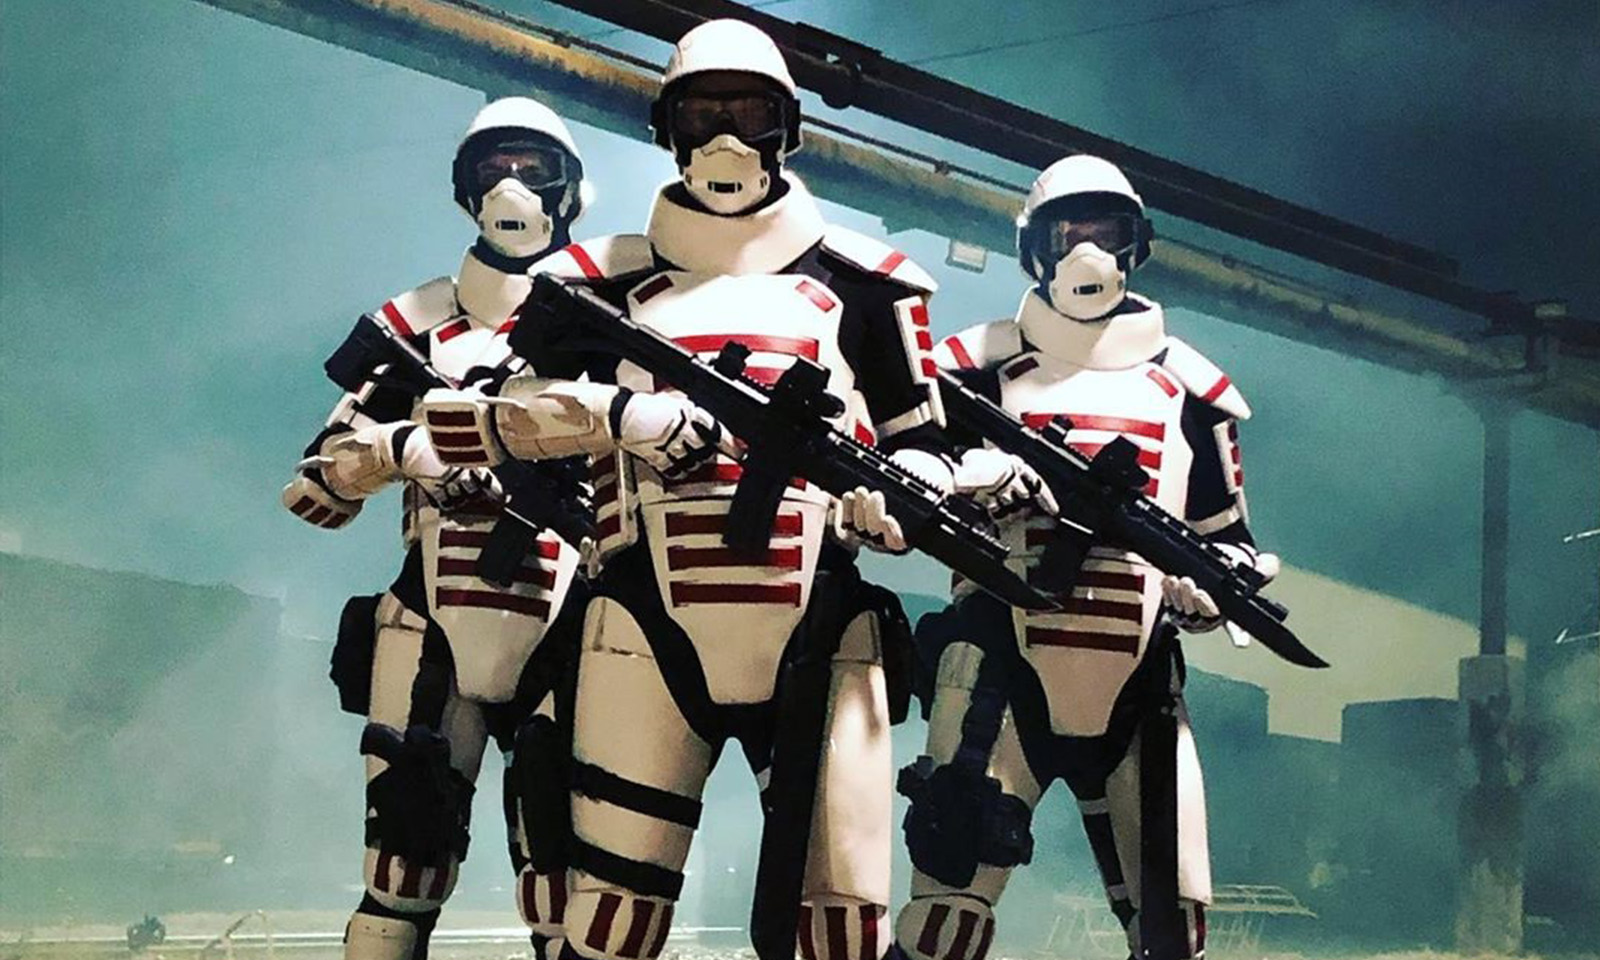 soldados de commonwealth no 16º episódio da 10ª temporada de The Walking Dead